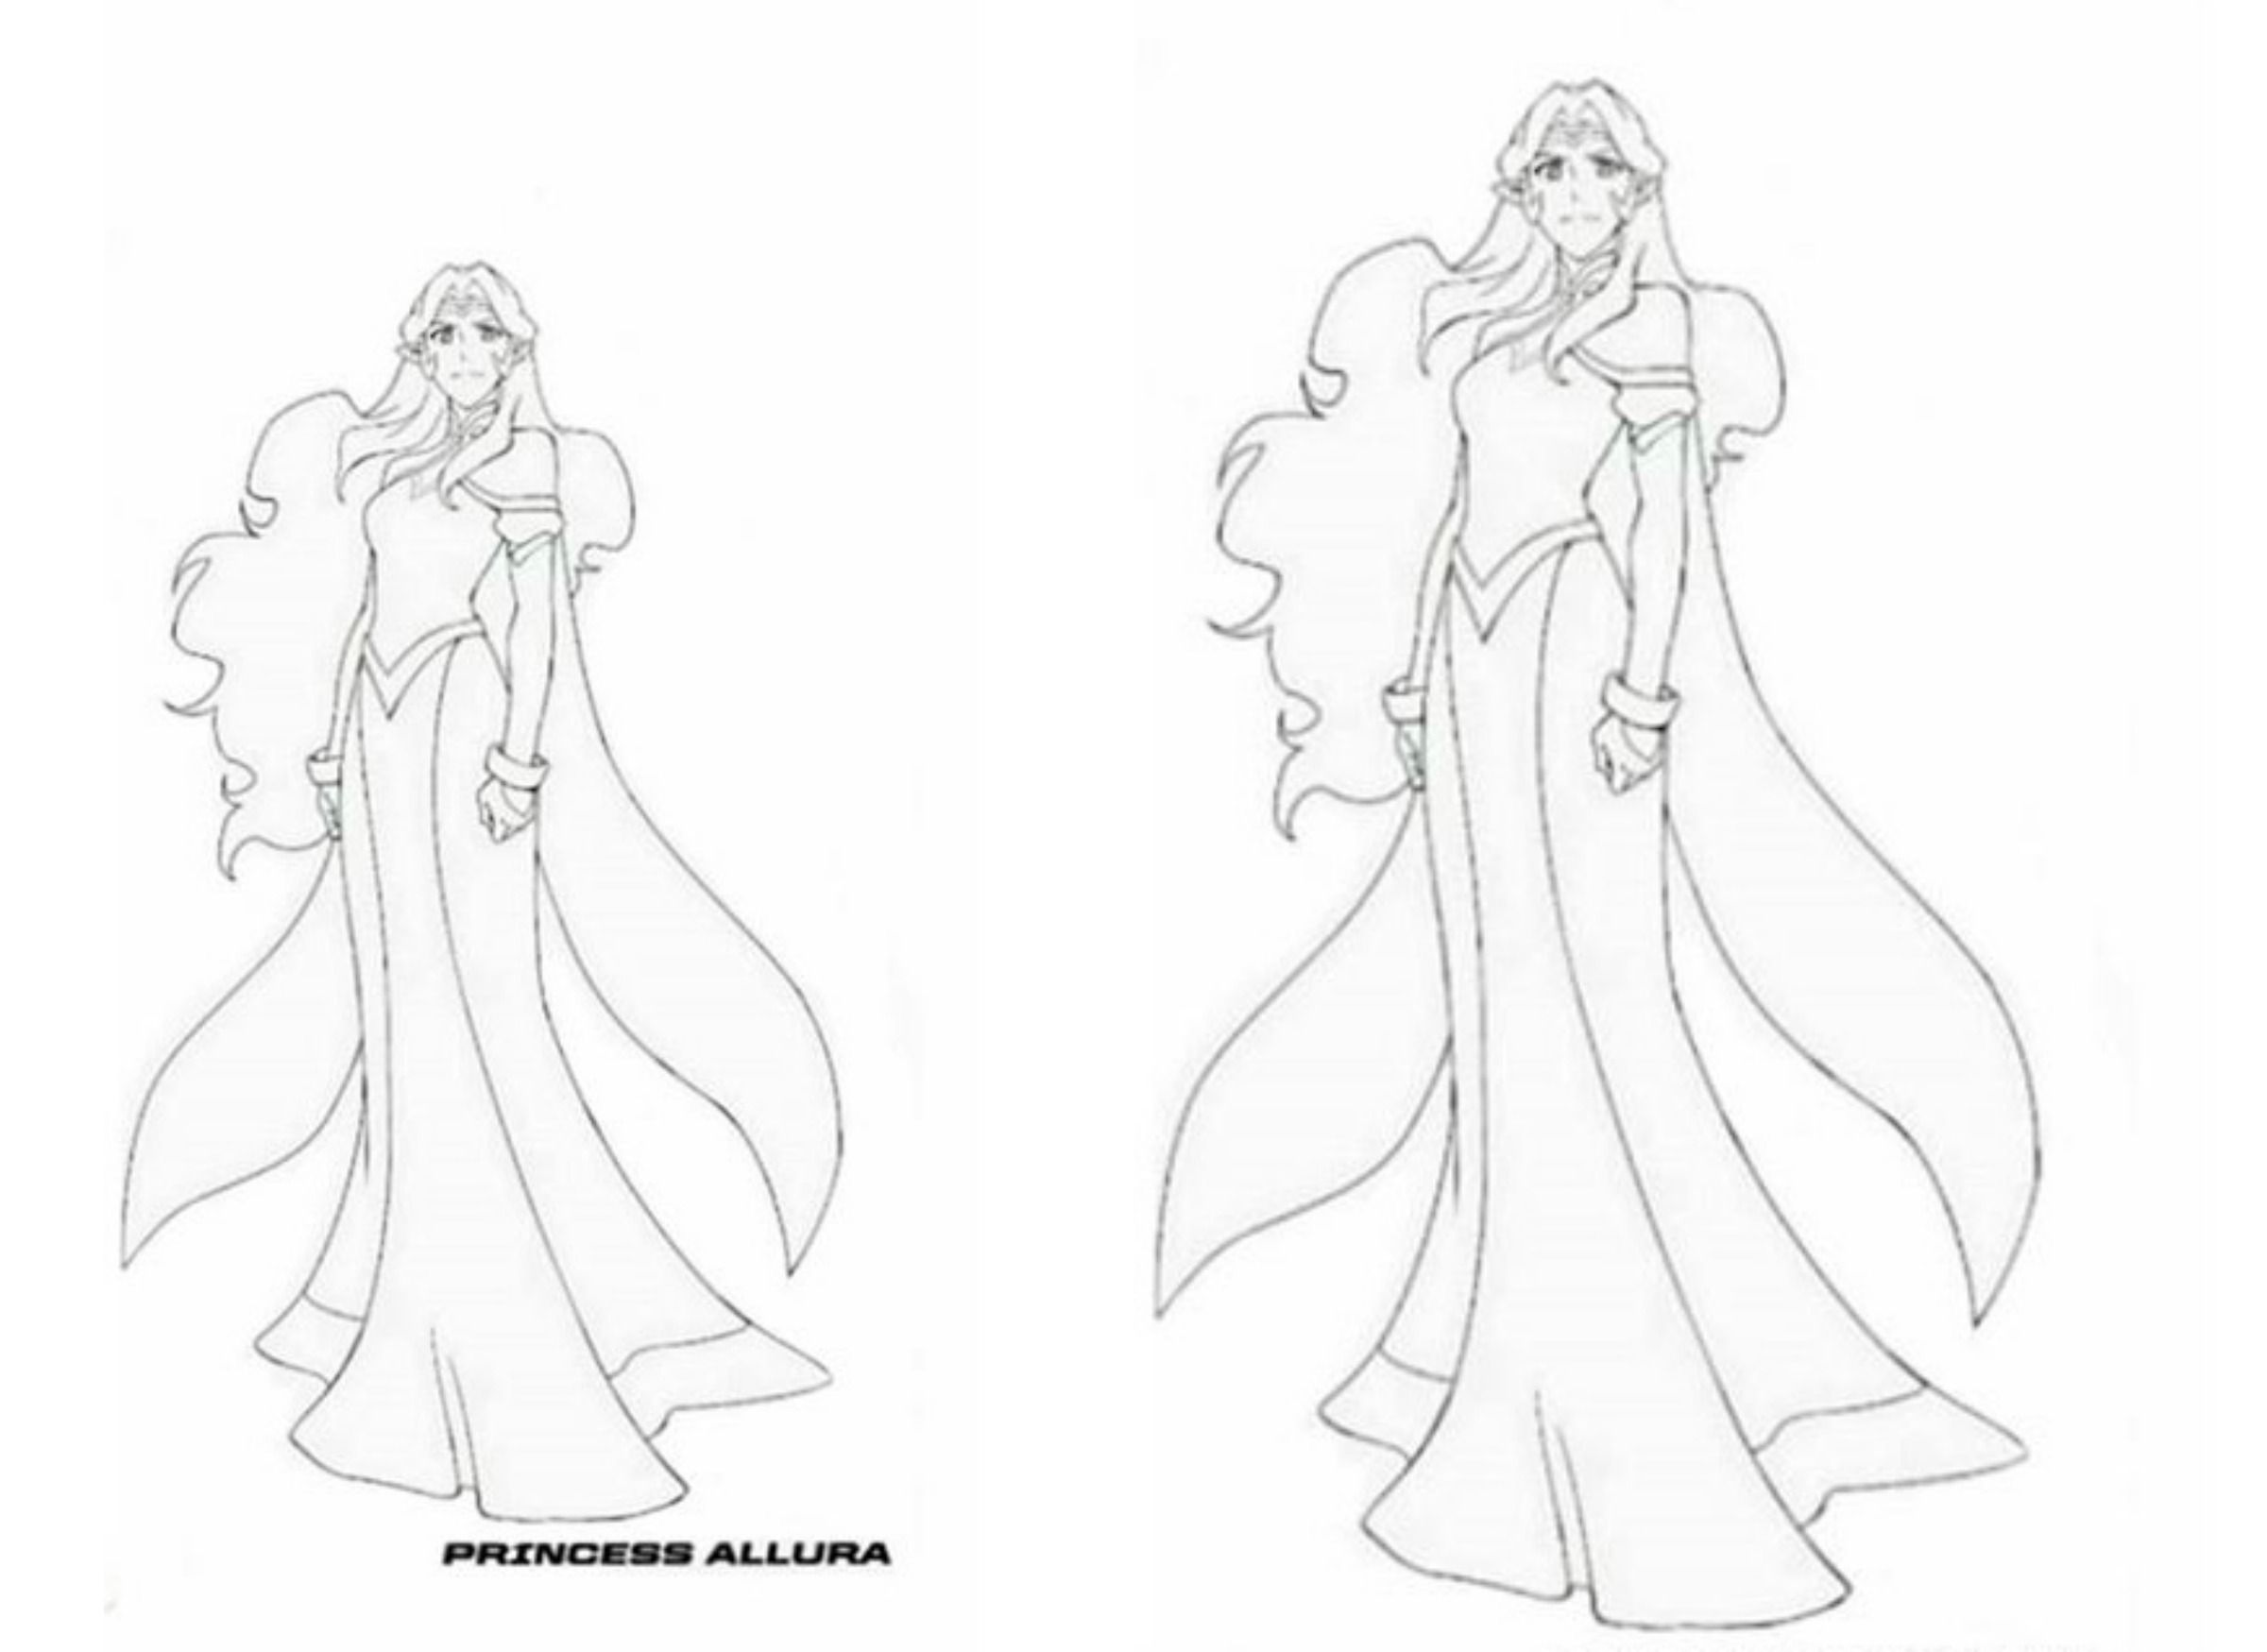 Princess Allura Voltron Legendary Defender Coloring Page | Voltron ...